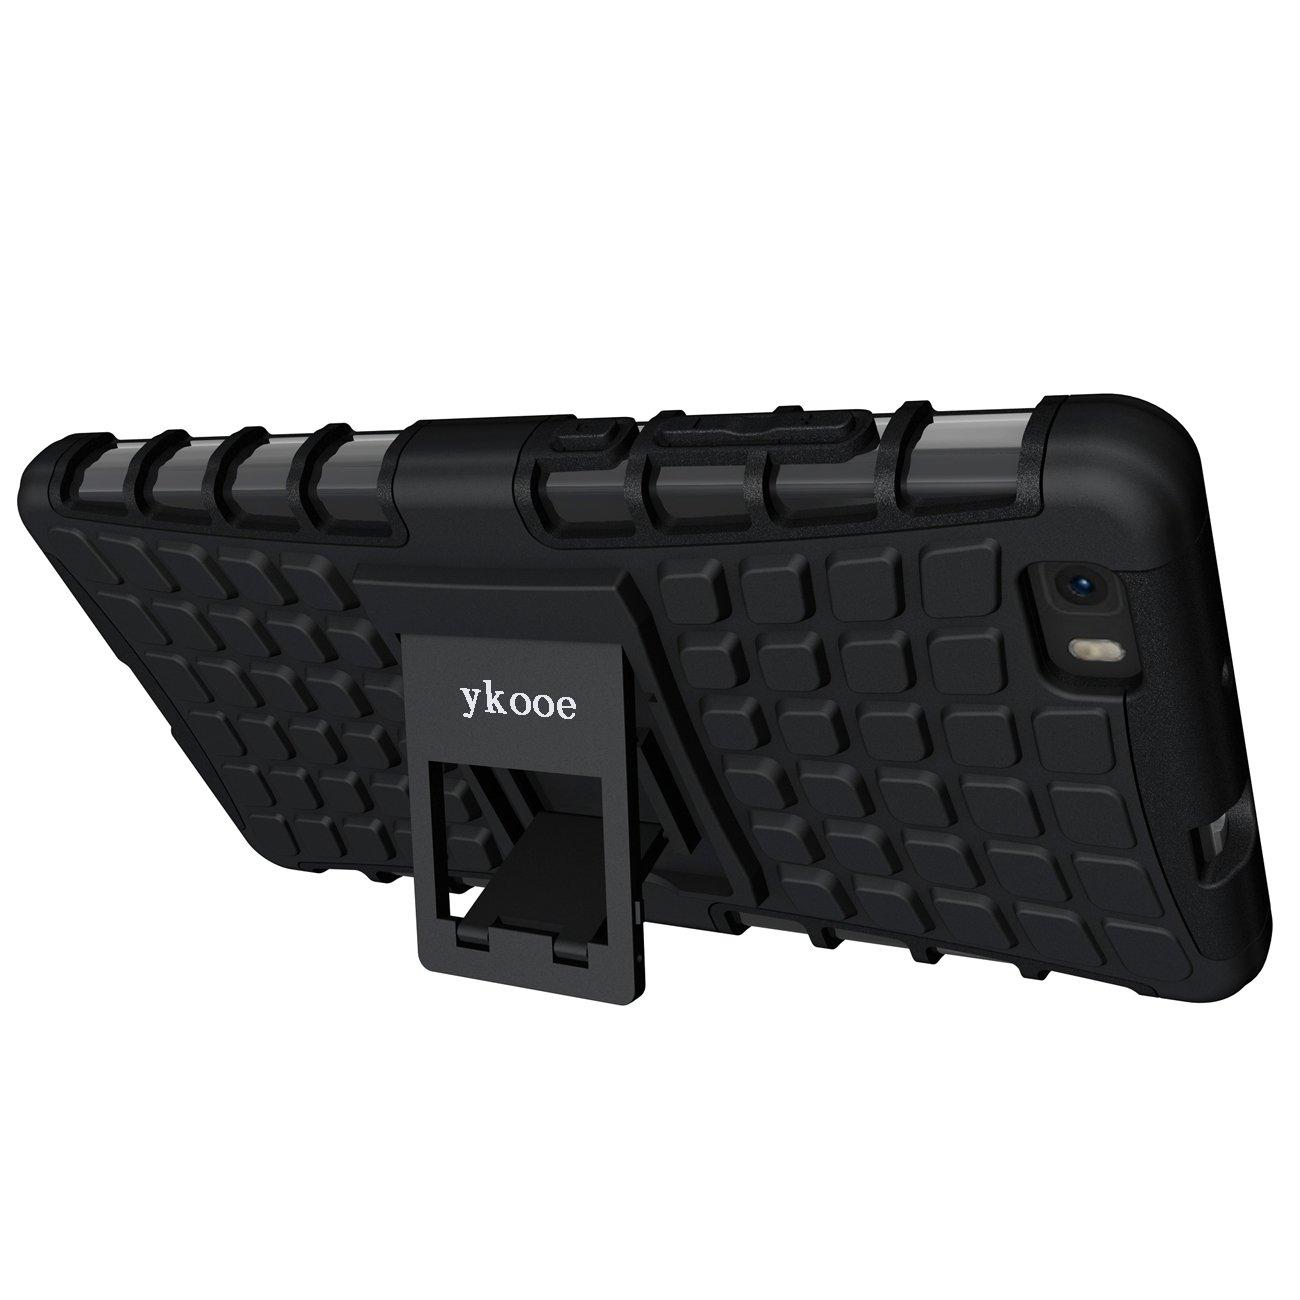 Amazon.com: Huawei P8 Lite Funda, ykooe Armor Heavy Duty ...